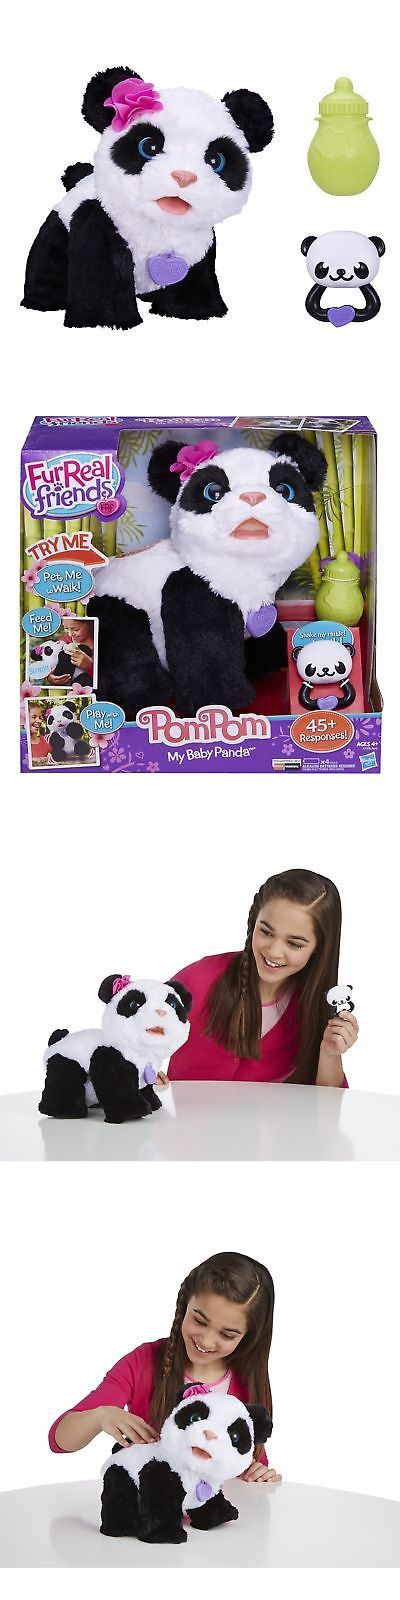 FurReal Friends 38288: Furreal Friends Pom Pom My Baby Panda Pet Standard Packaging -> BUY IT NOW ONLY: $71.02 on eBay!